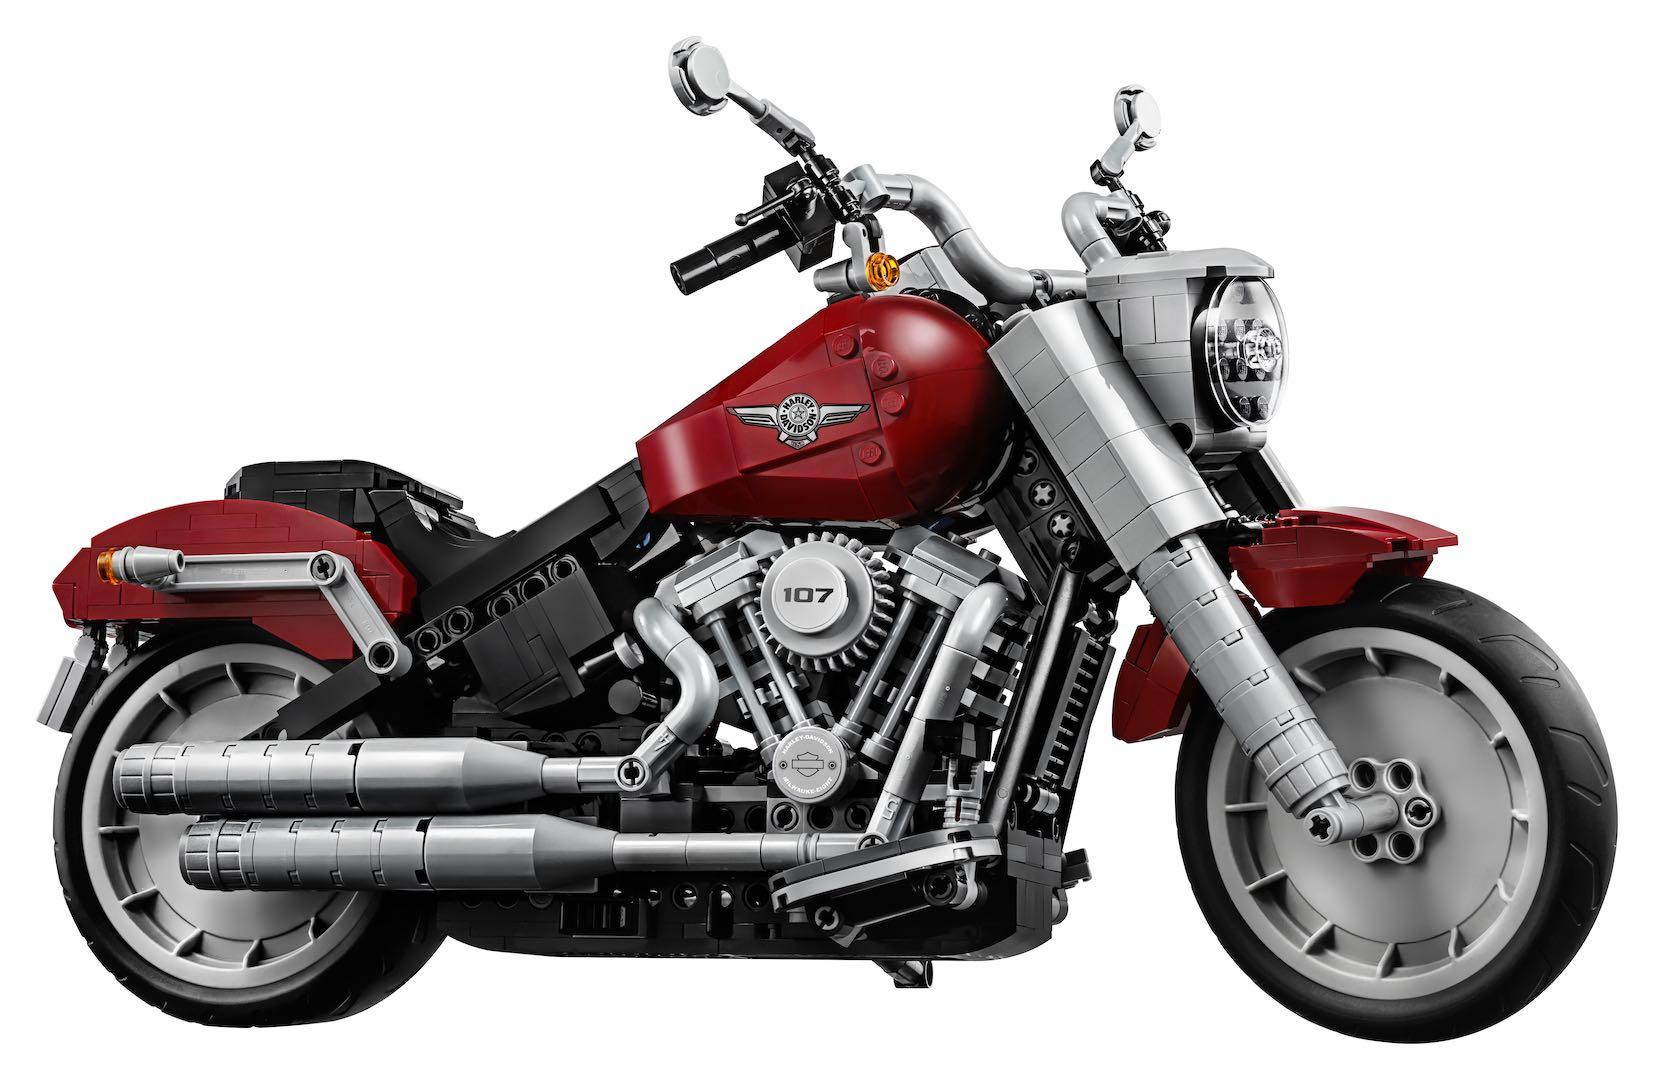 Harley Davidson Toys Fat Boy LEGO model